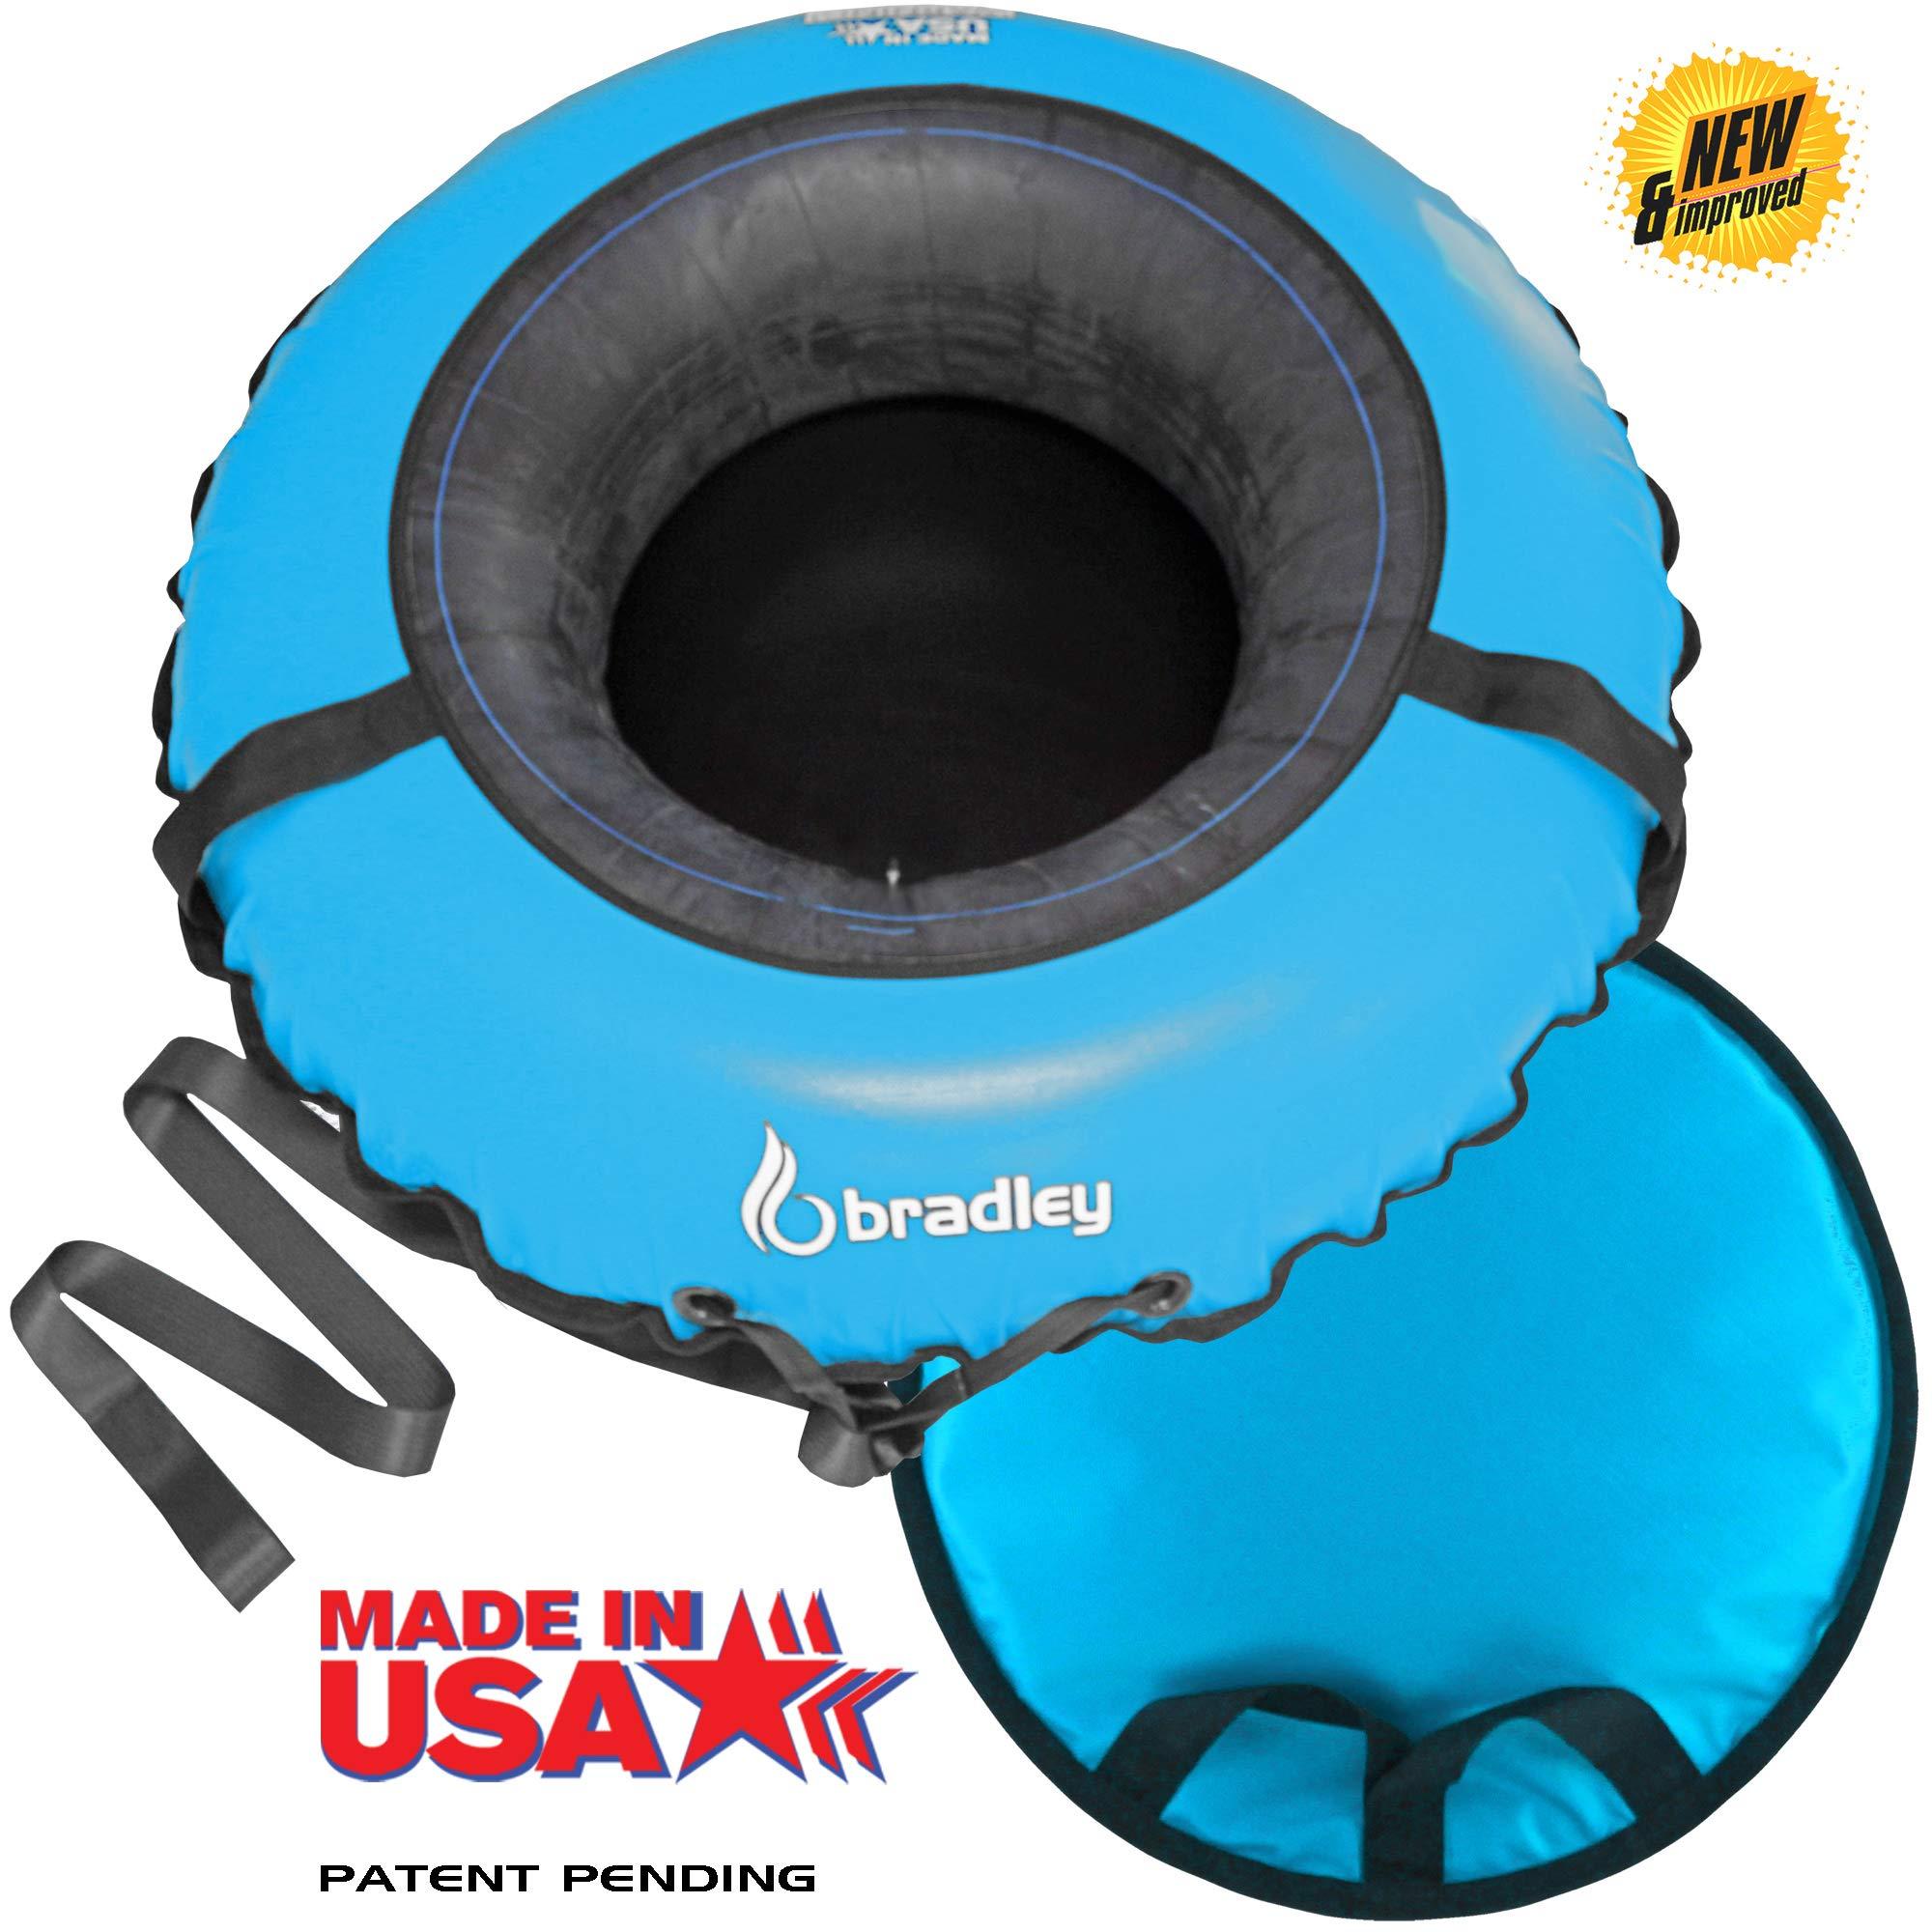 Bradley Tow-able Snow Tube with 50'' Cover | Sledding Tubes | Inflatable Snow Sled | Snow Saucer | Heavy Duty Snow Tube